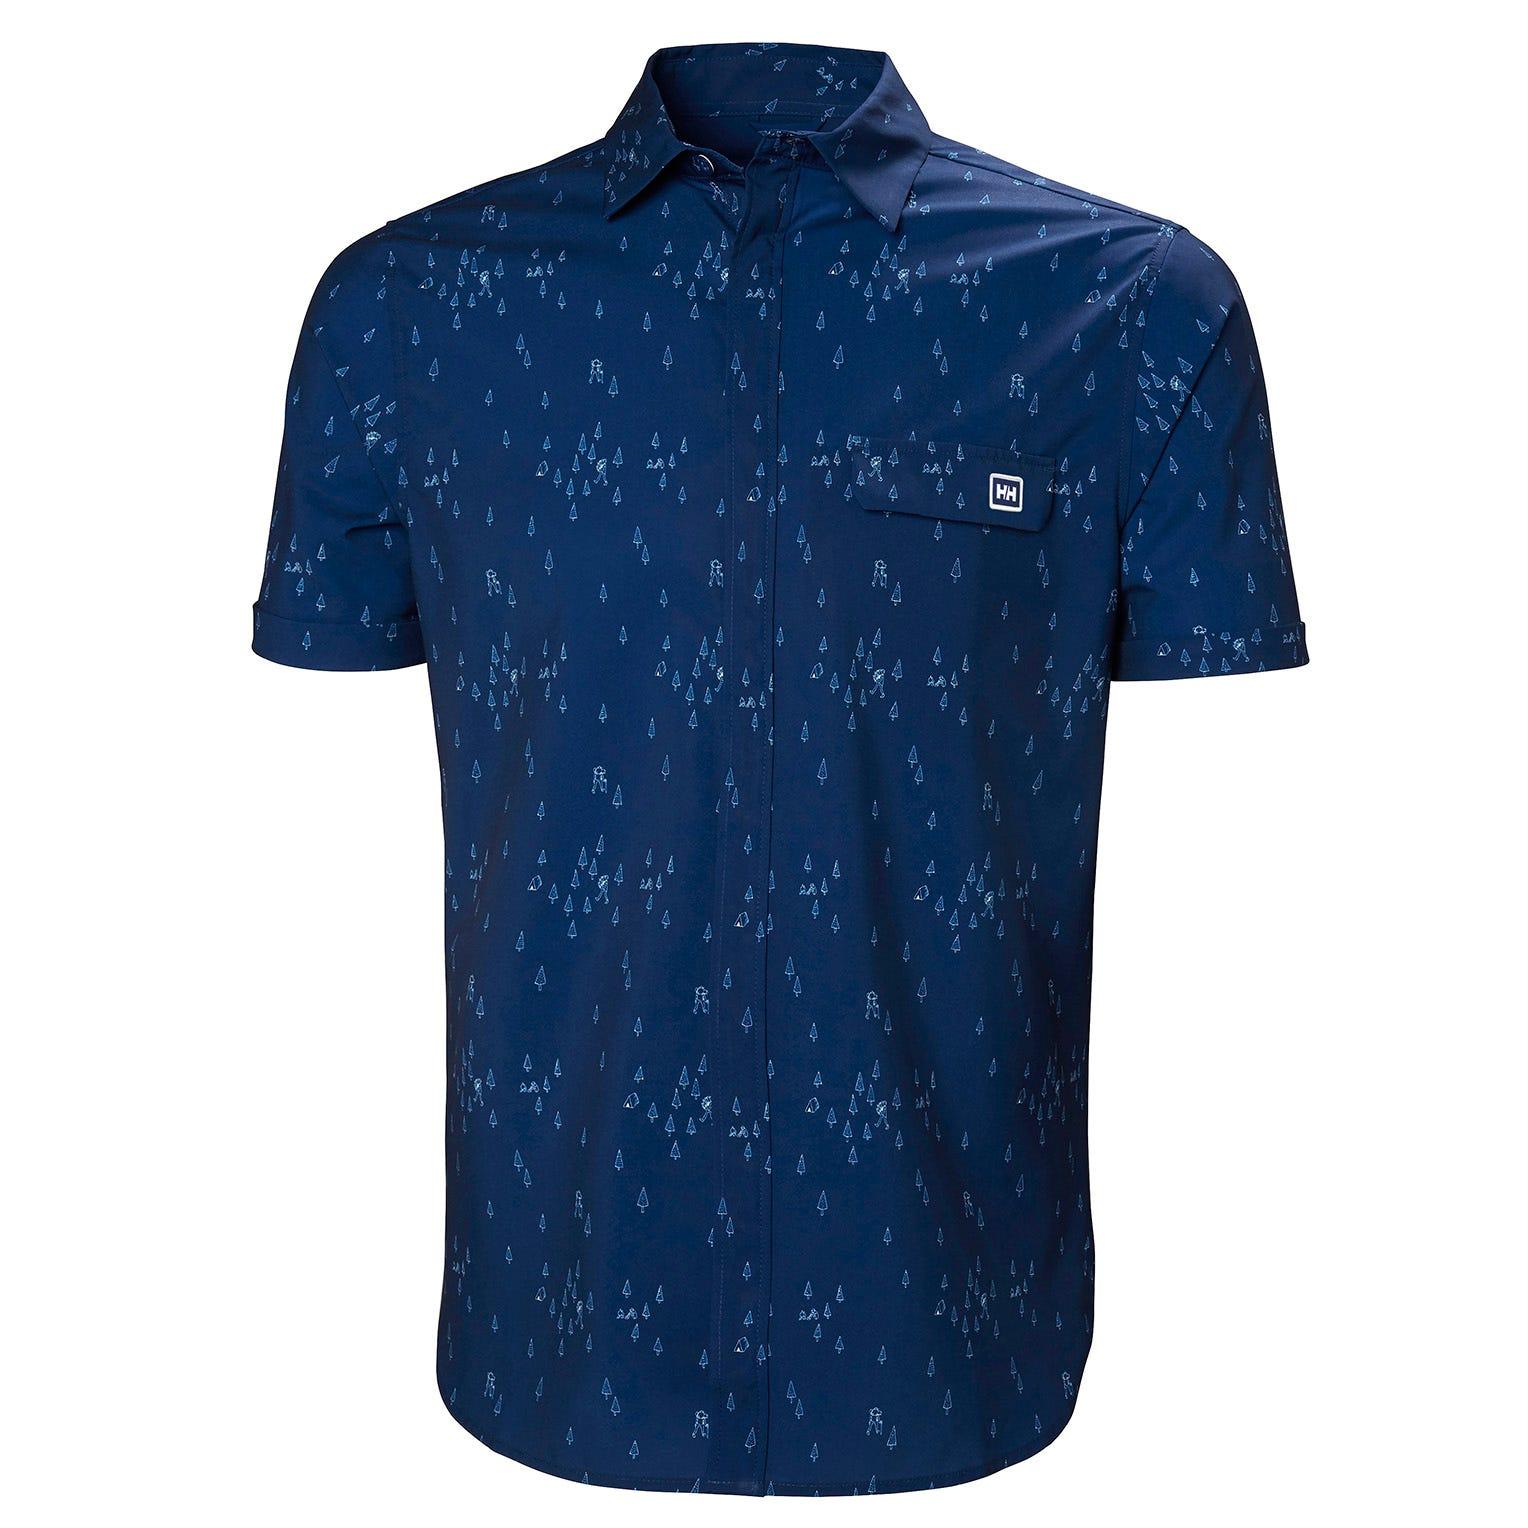 Helly Hansen Oya Shirt Mens Midlayer Blue M